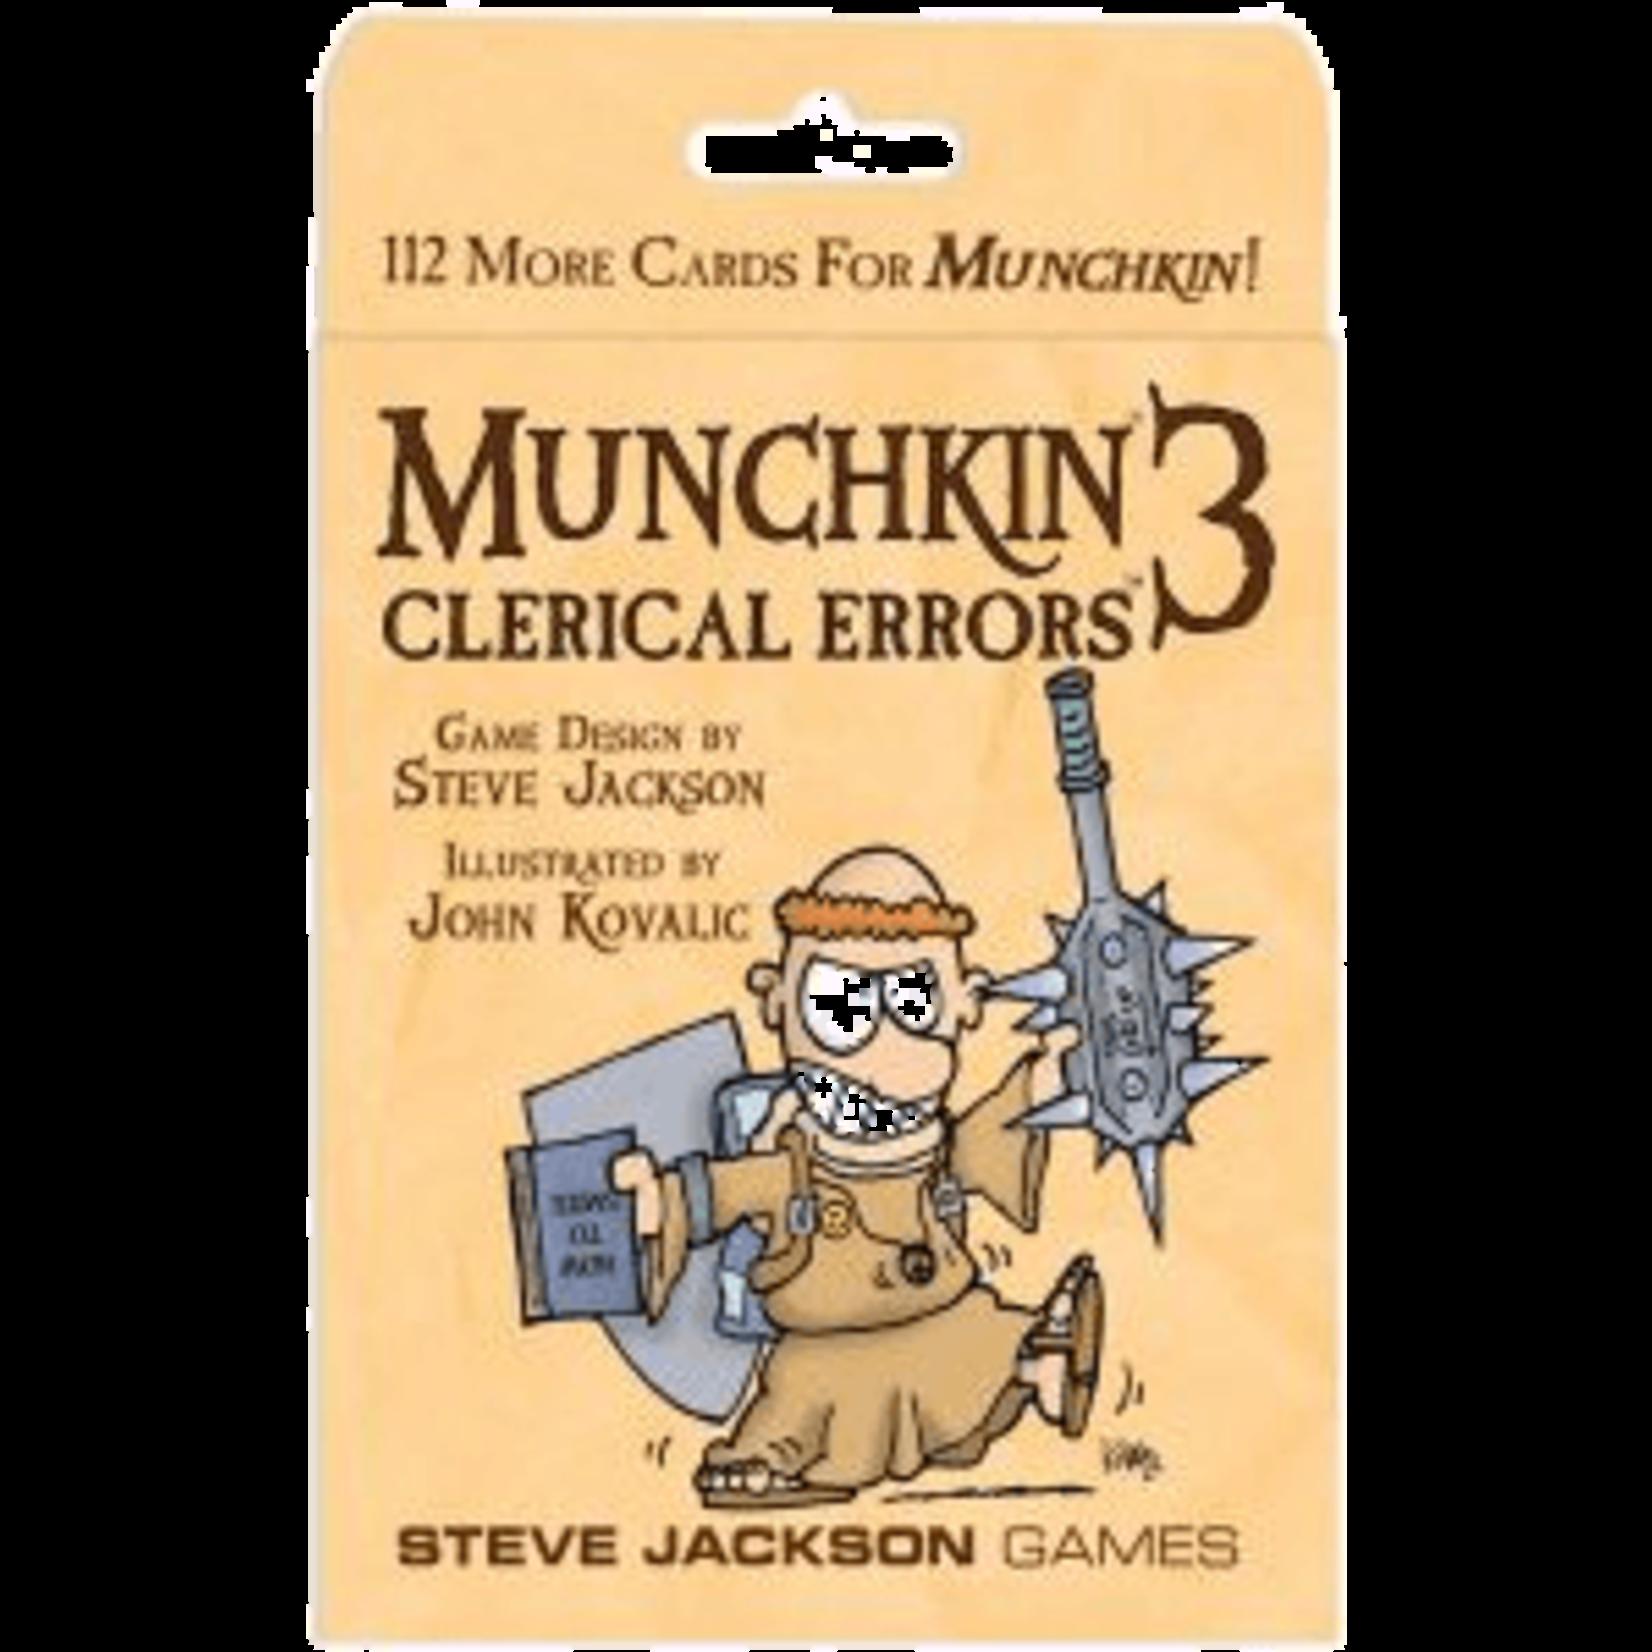 Steve Jackson Games Munchkin 3: Clerical Errors Expansion